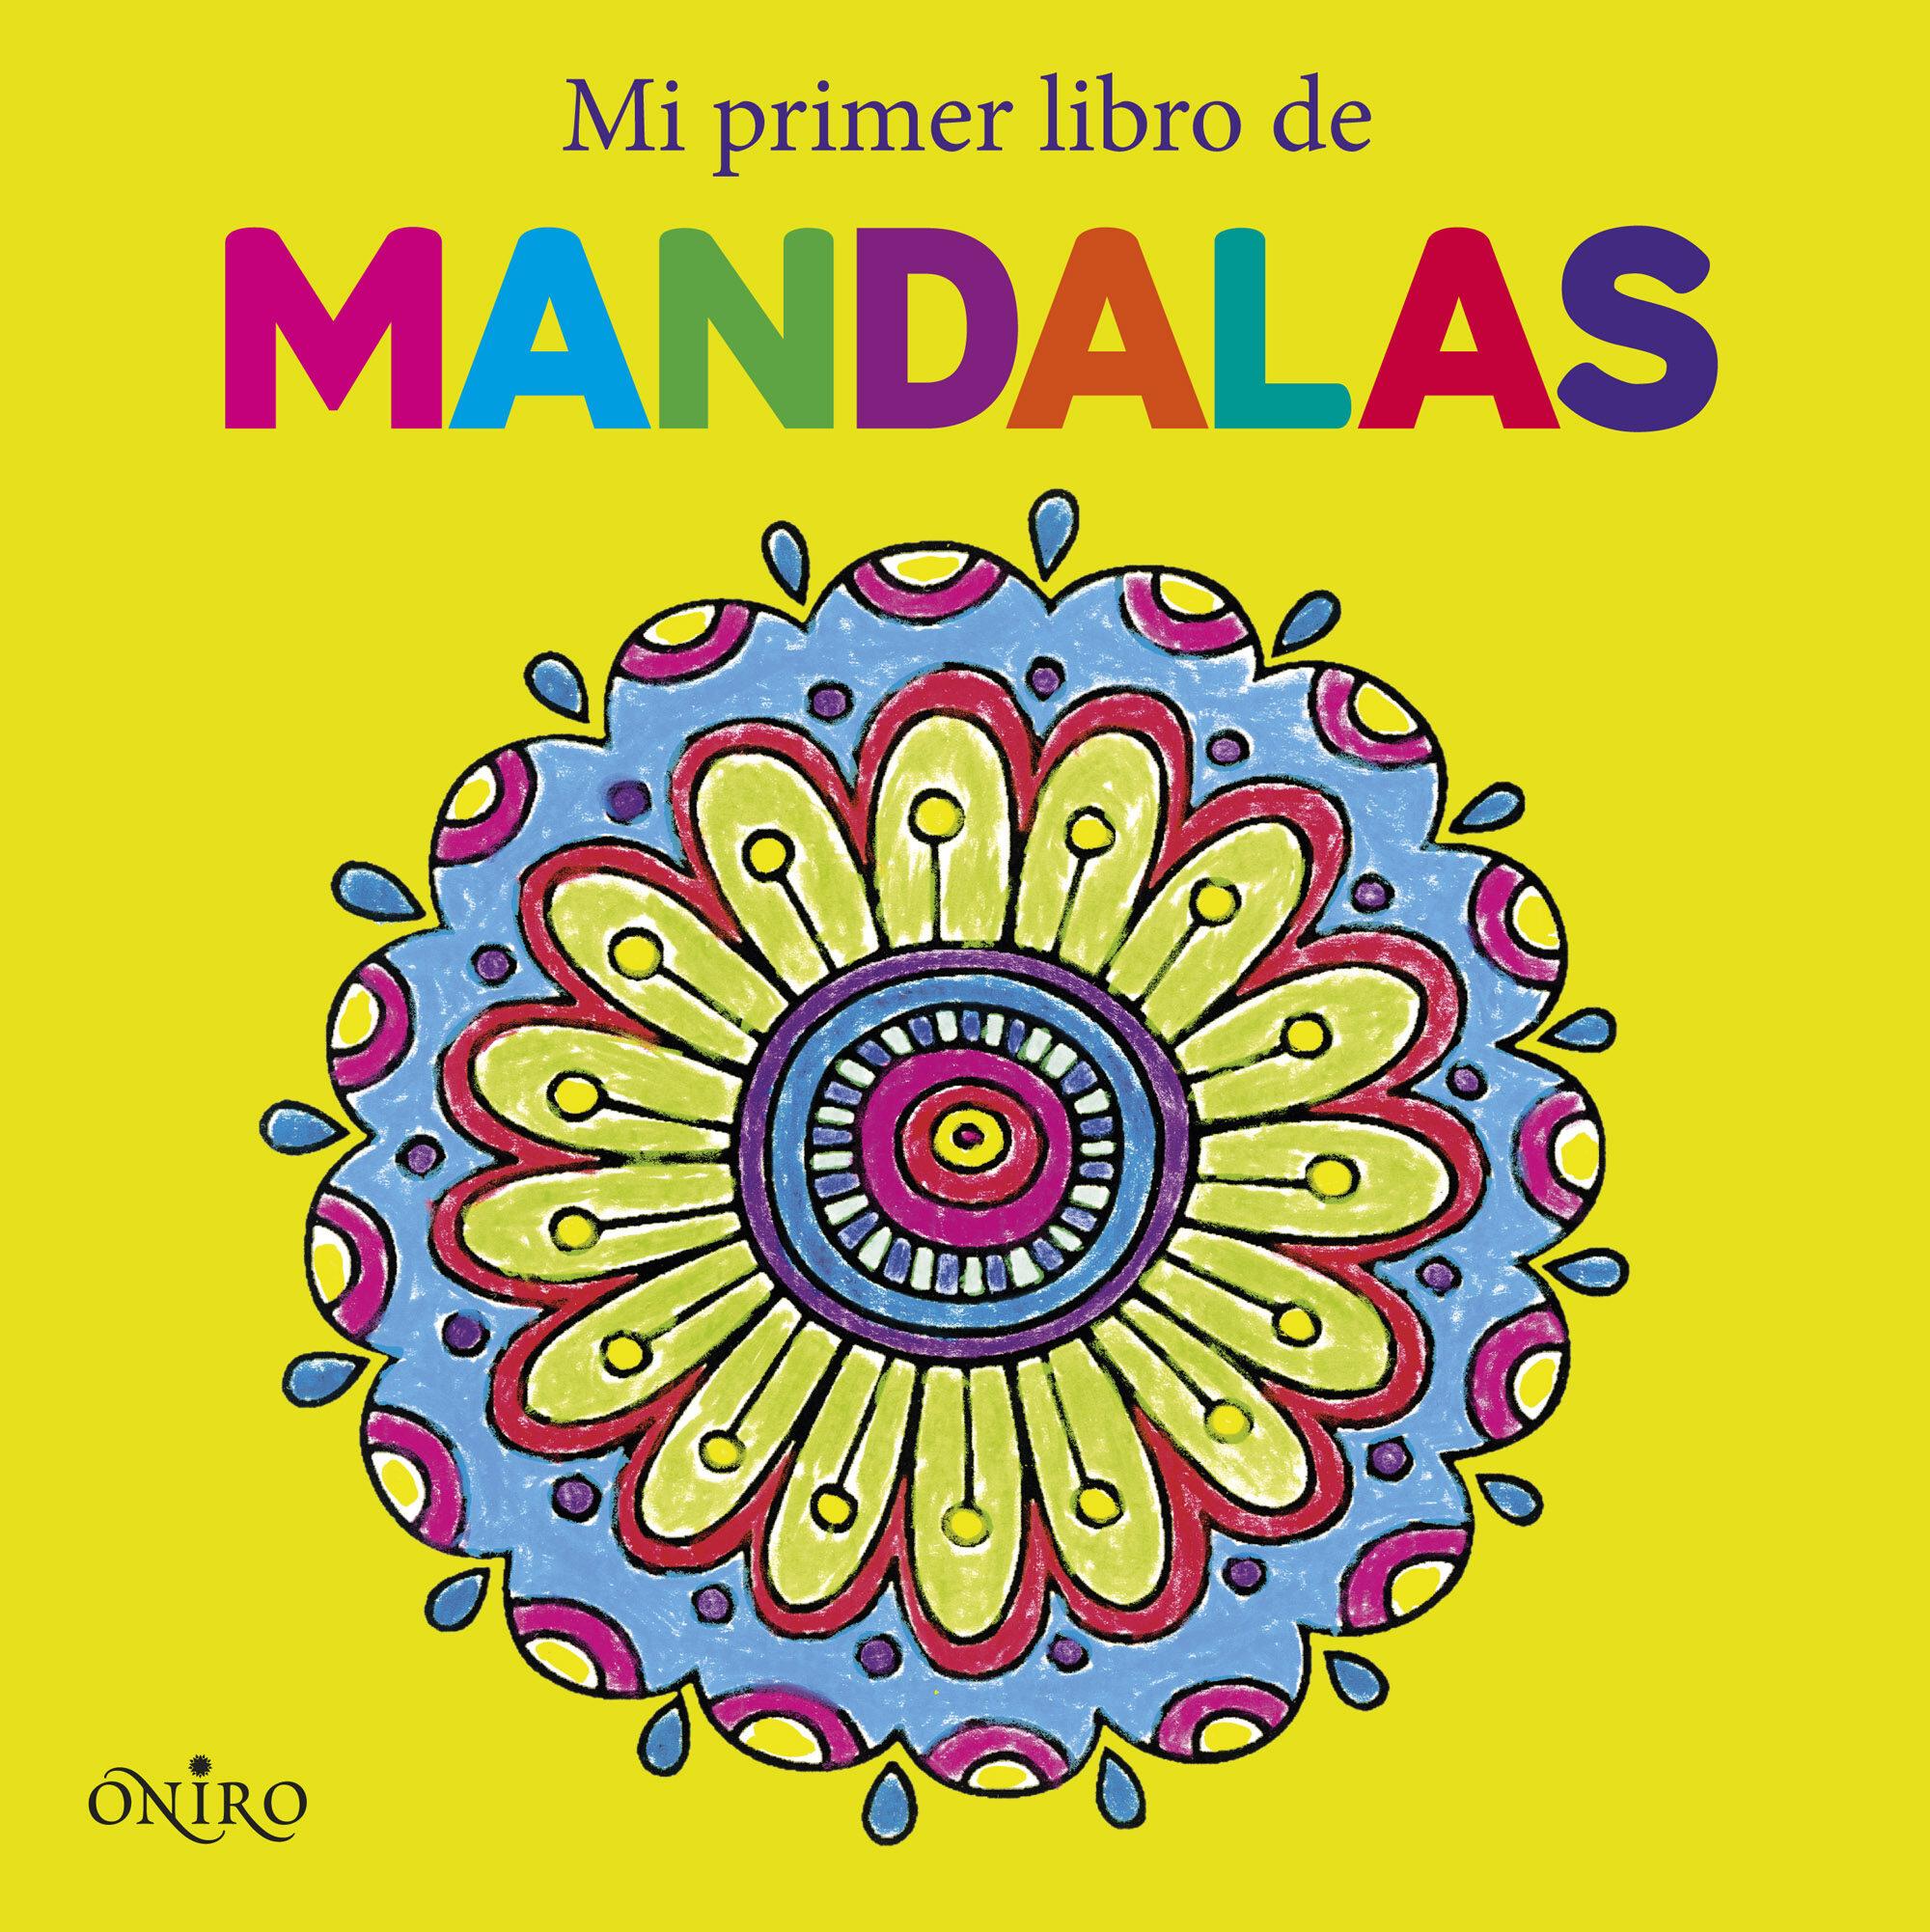 MI PRIMER LIBRO DE MANDALAS | VV.AA. | Comprar libro 9788497547765